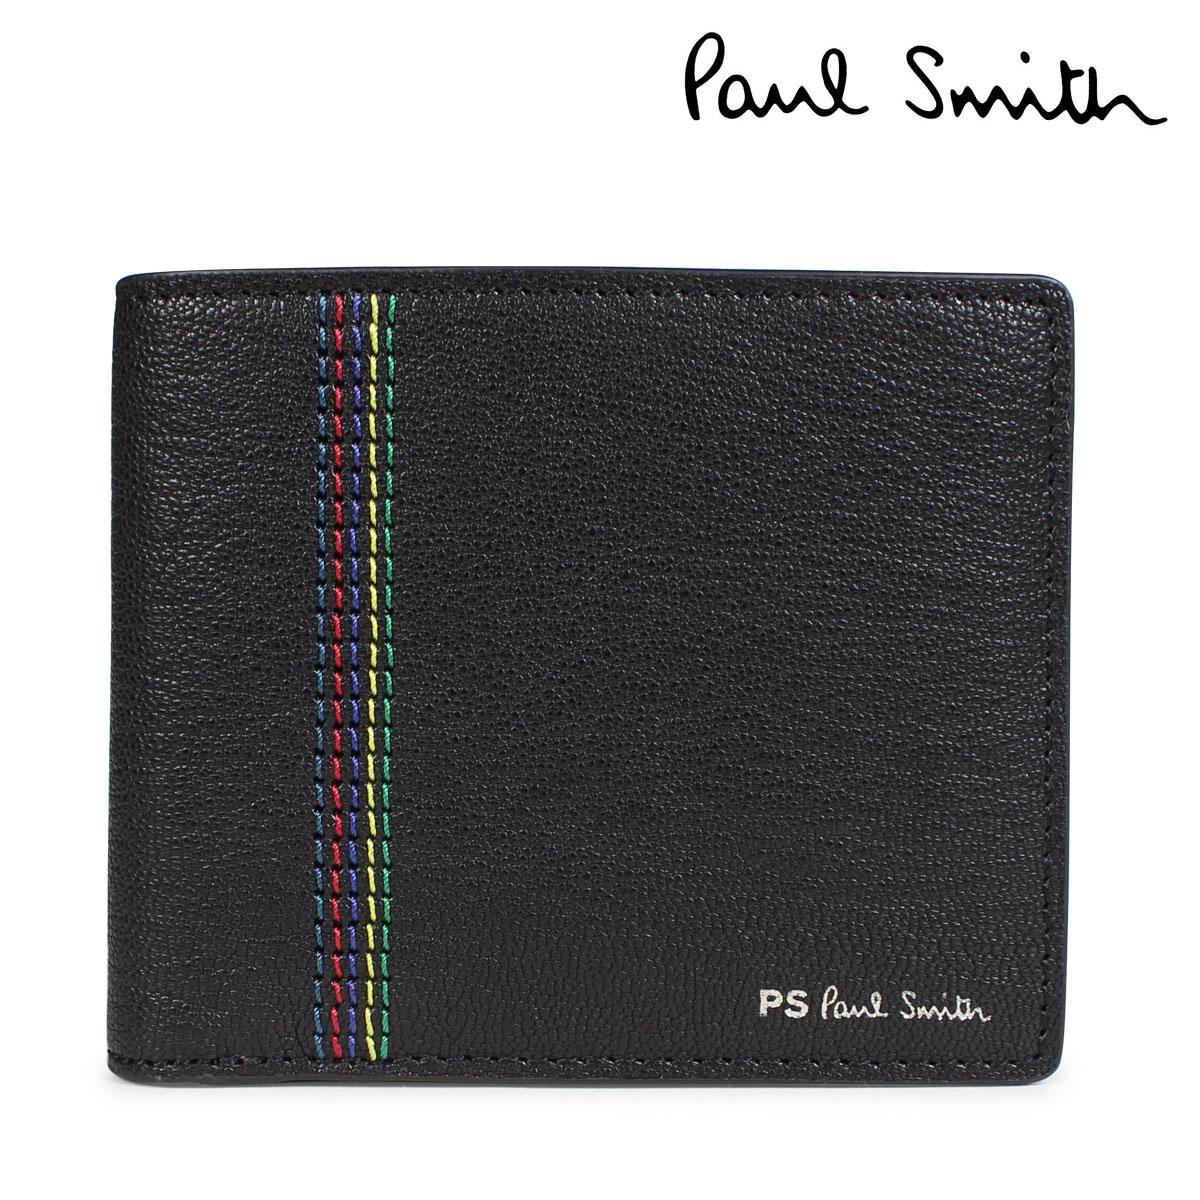 Paul Smith 財布 メンズ 二つ折り ポールスミス WALLET レザー ブラック M2A 5321 APSSTI [10/11 新入荷]